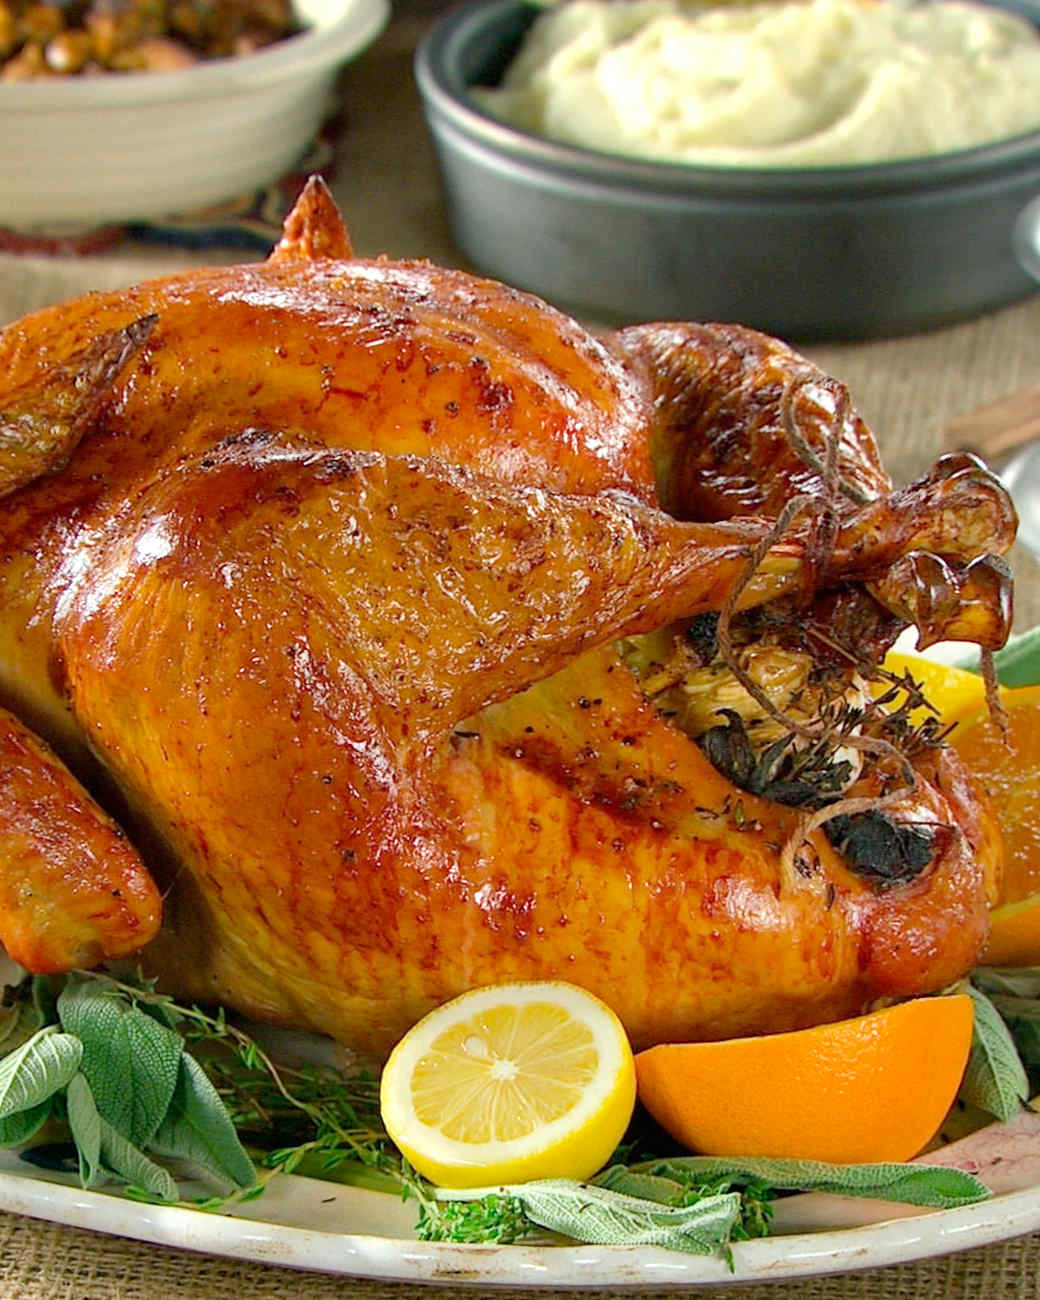 turkey stuffed with lemon and herbs